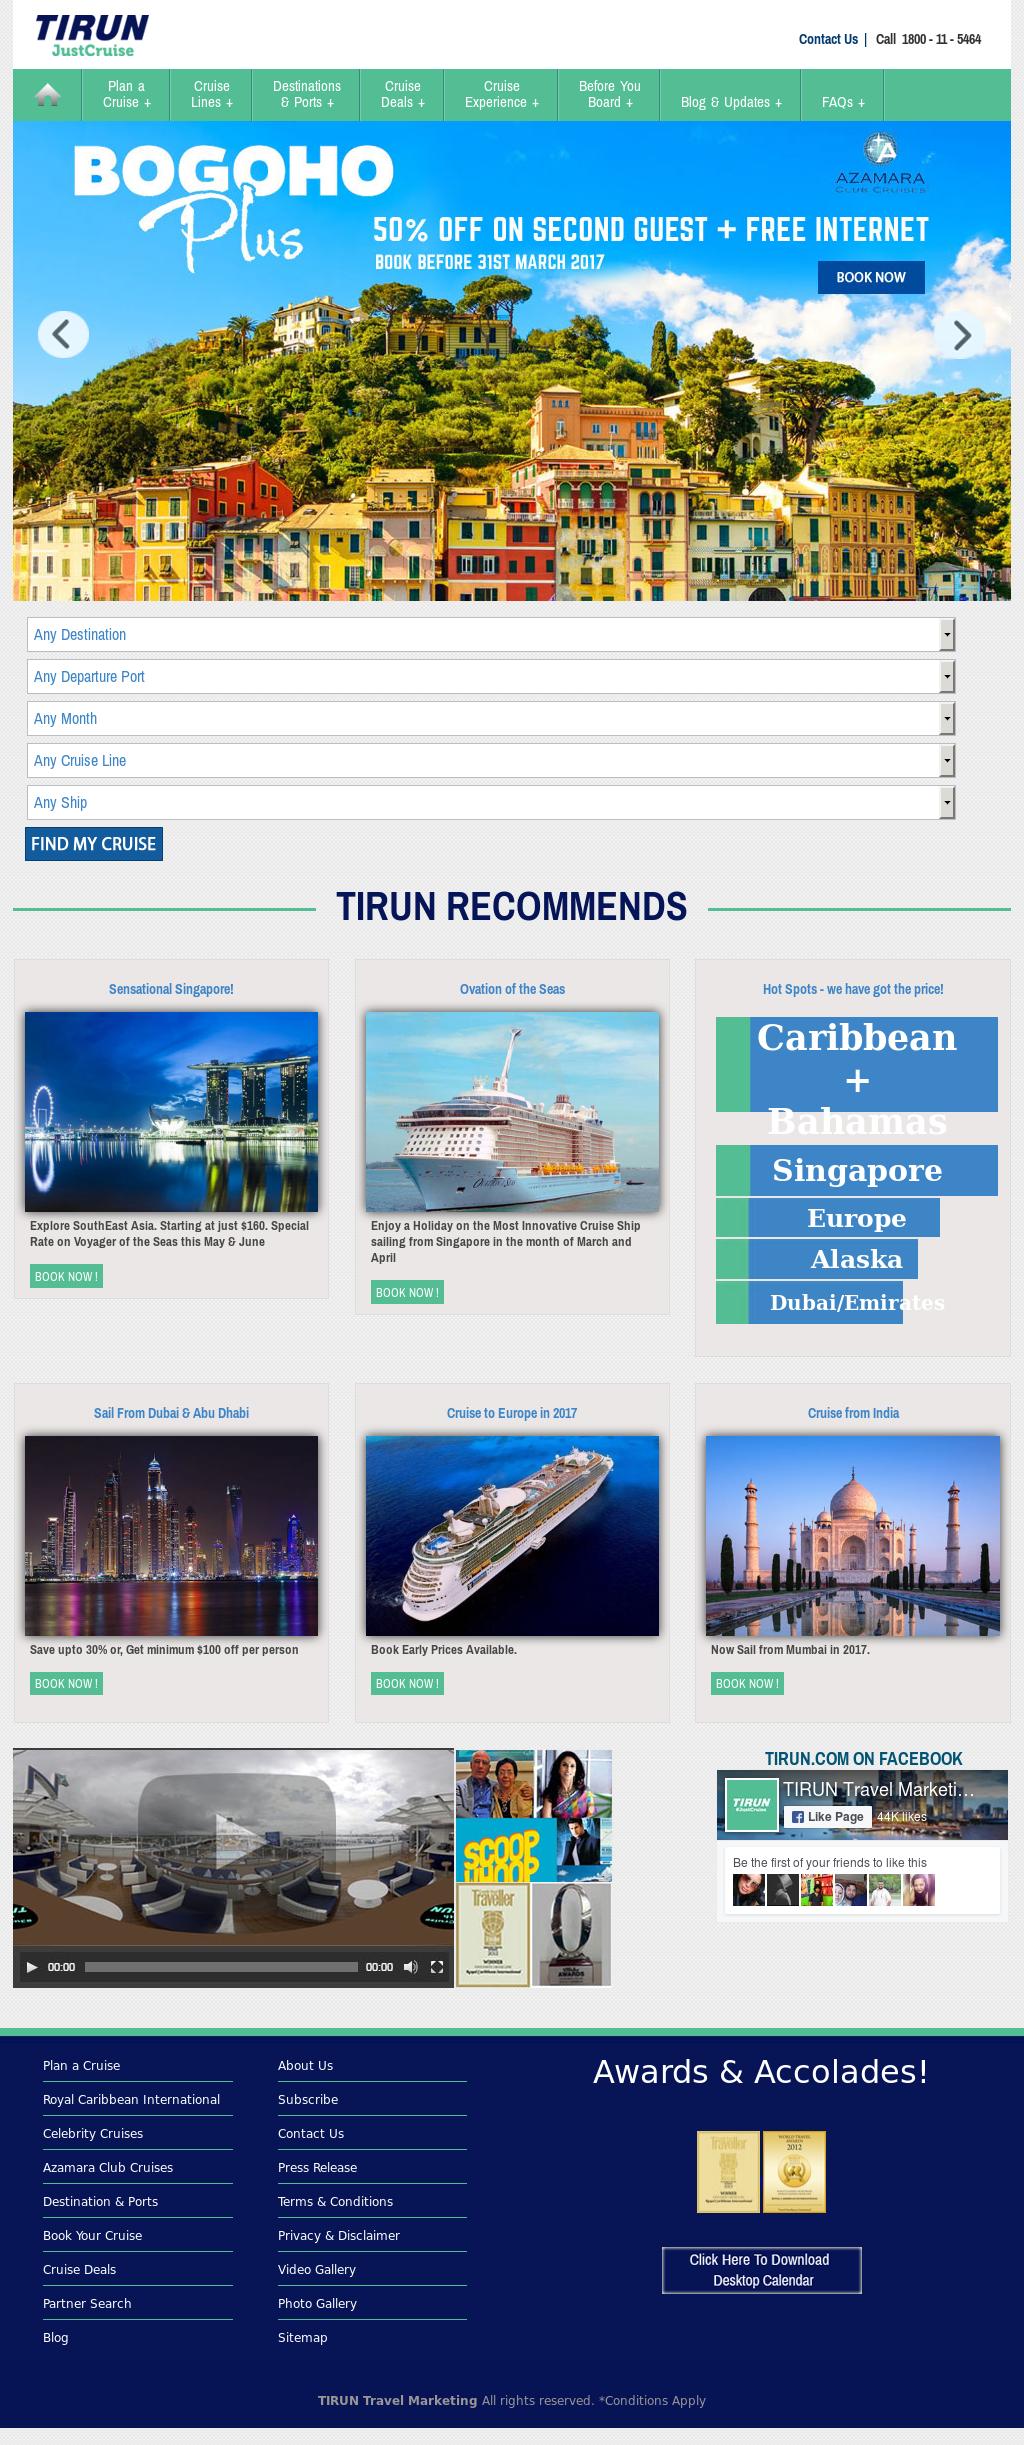 TIRUN Competitors, Revenue and Employees - Owler Company Profile